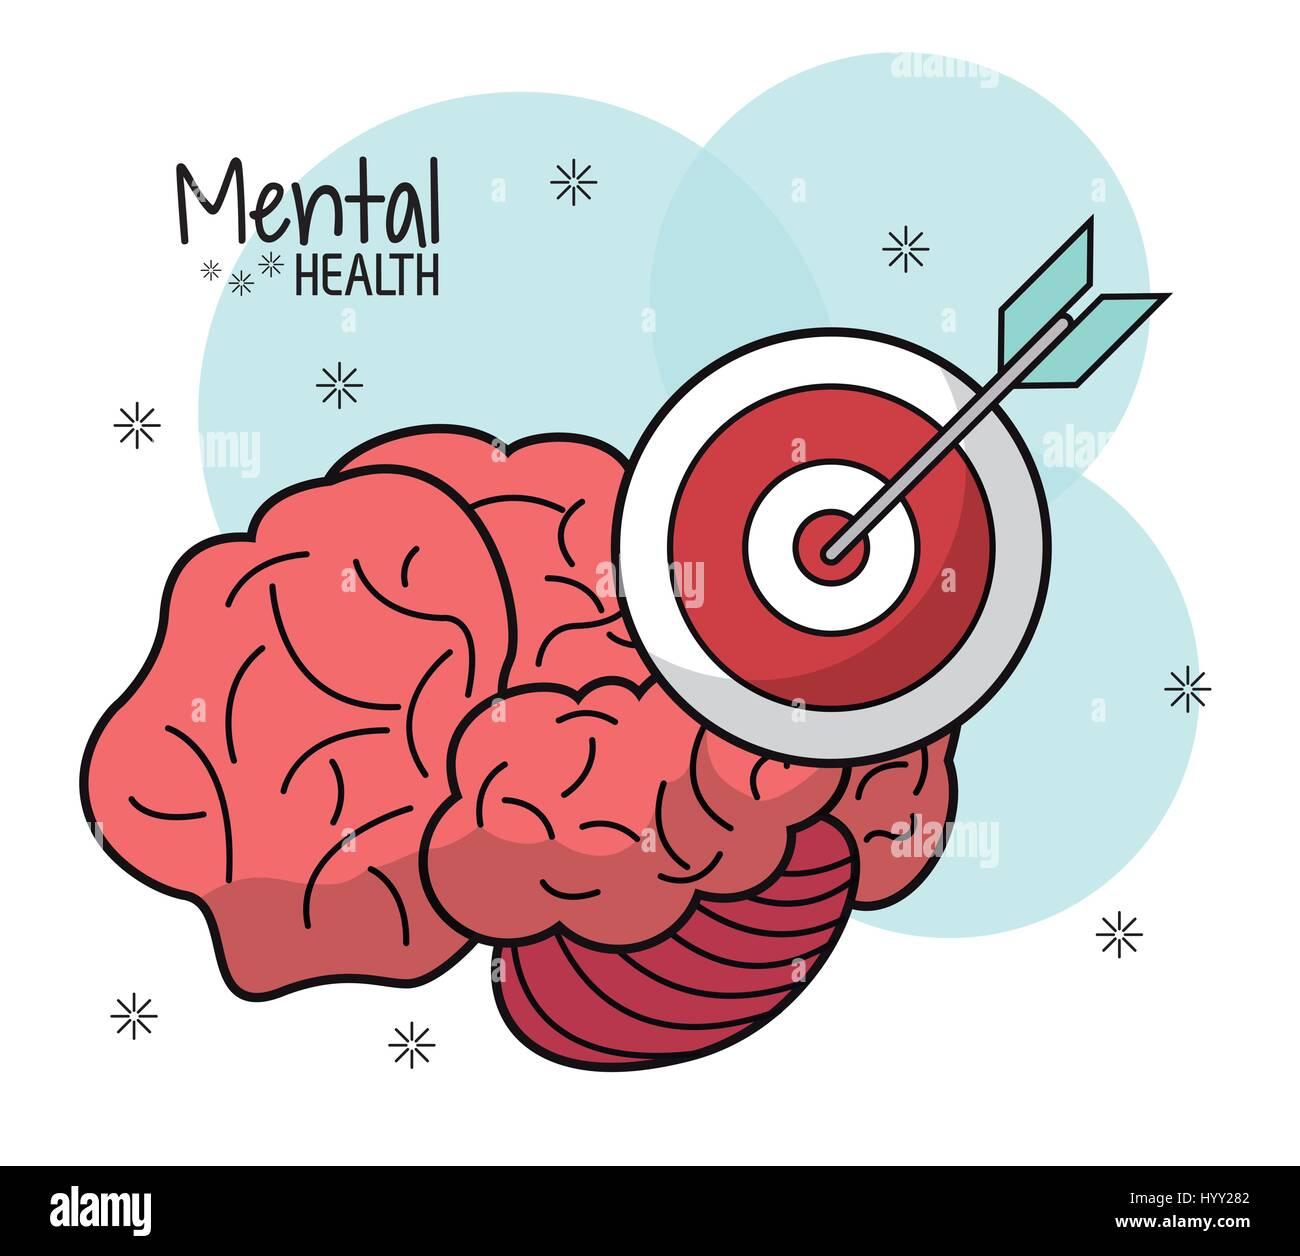 Cerebro Mental Health target innovación Imagen De Stock